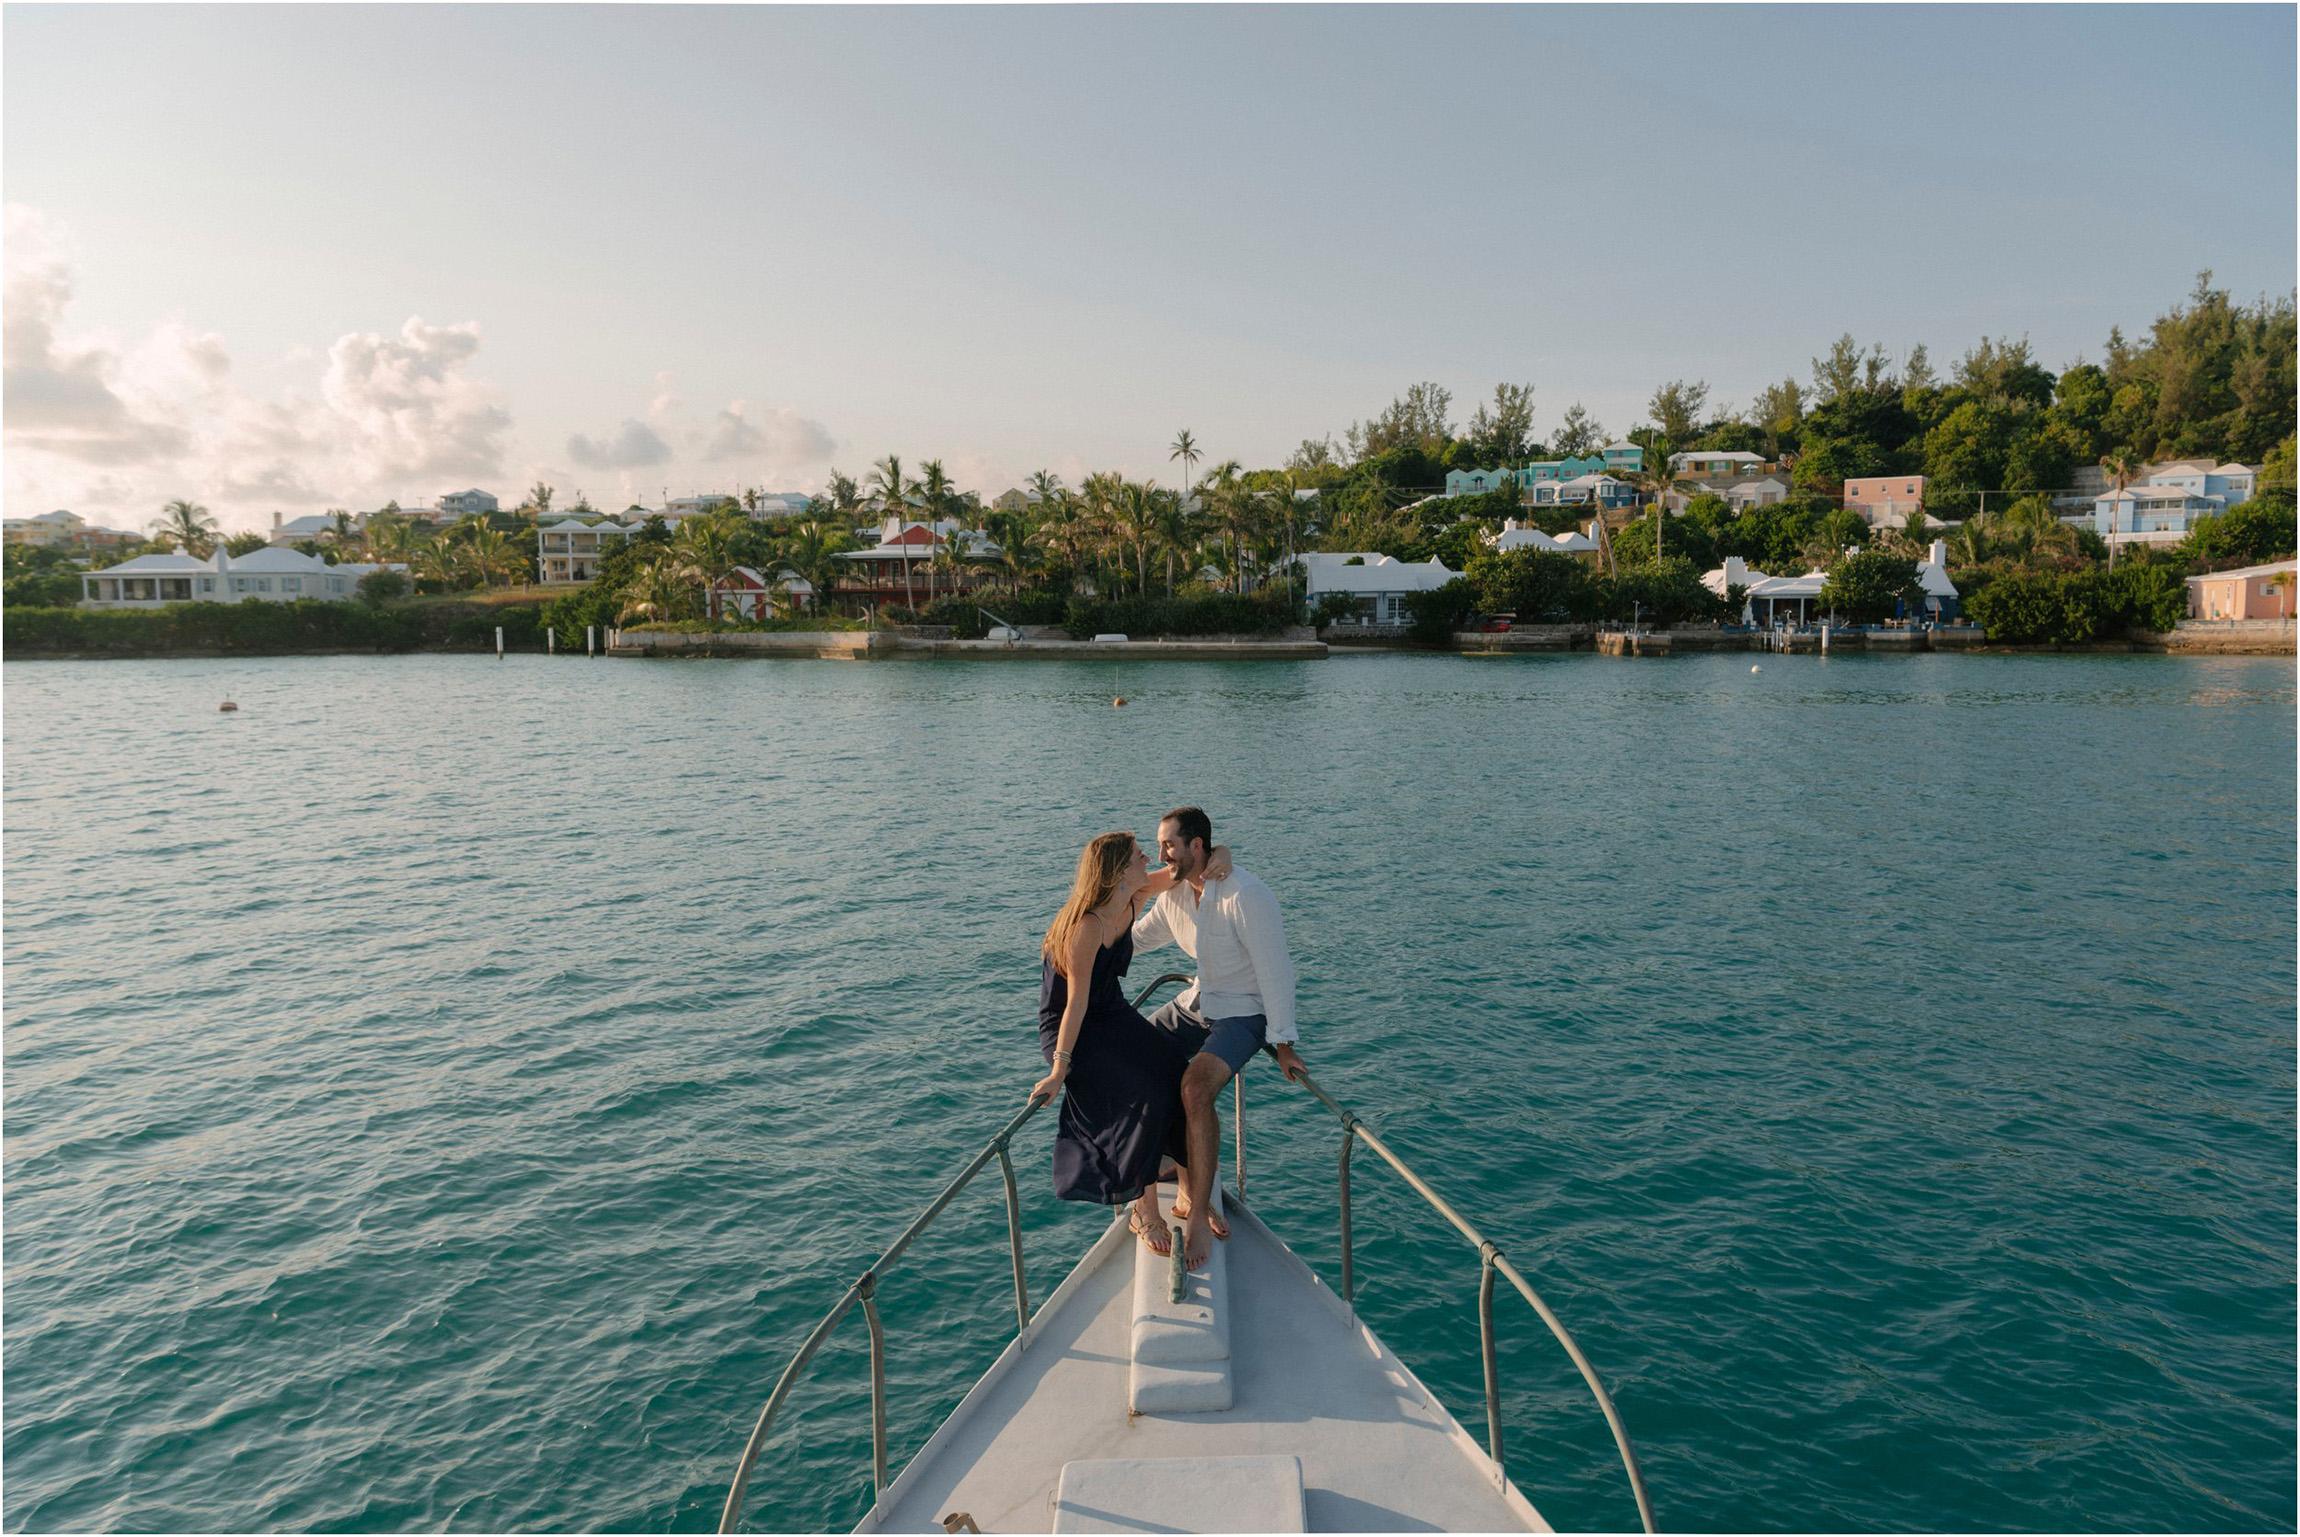 ©FianderFoto_Proposal Photographer_Bermuda_Kelly_Mike_022.jpg